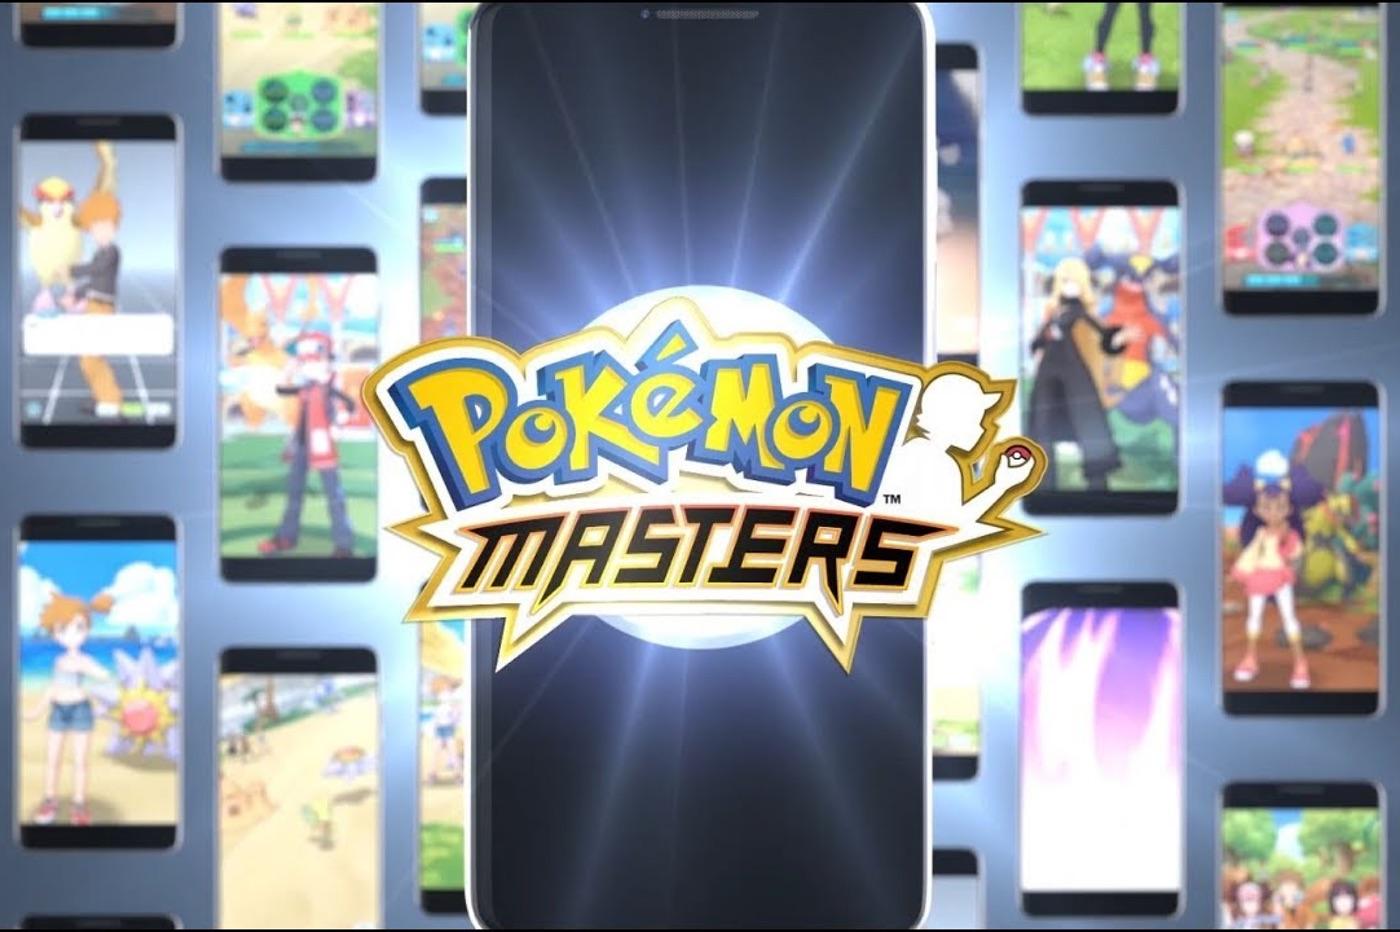 Pokémon Masters : bande-annonce du prochain jeu mobile Pokémon 1